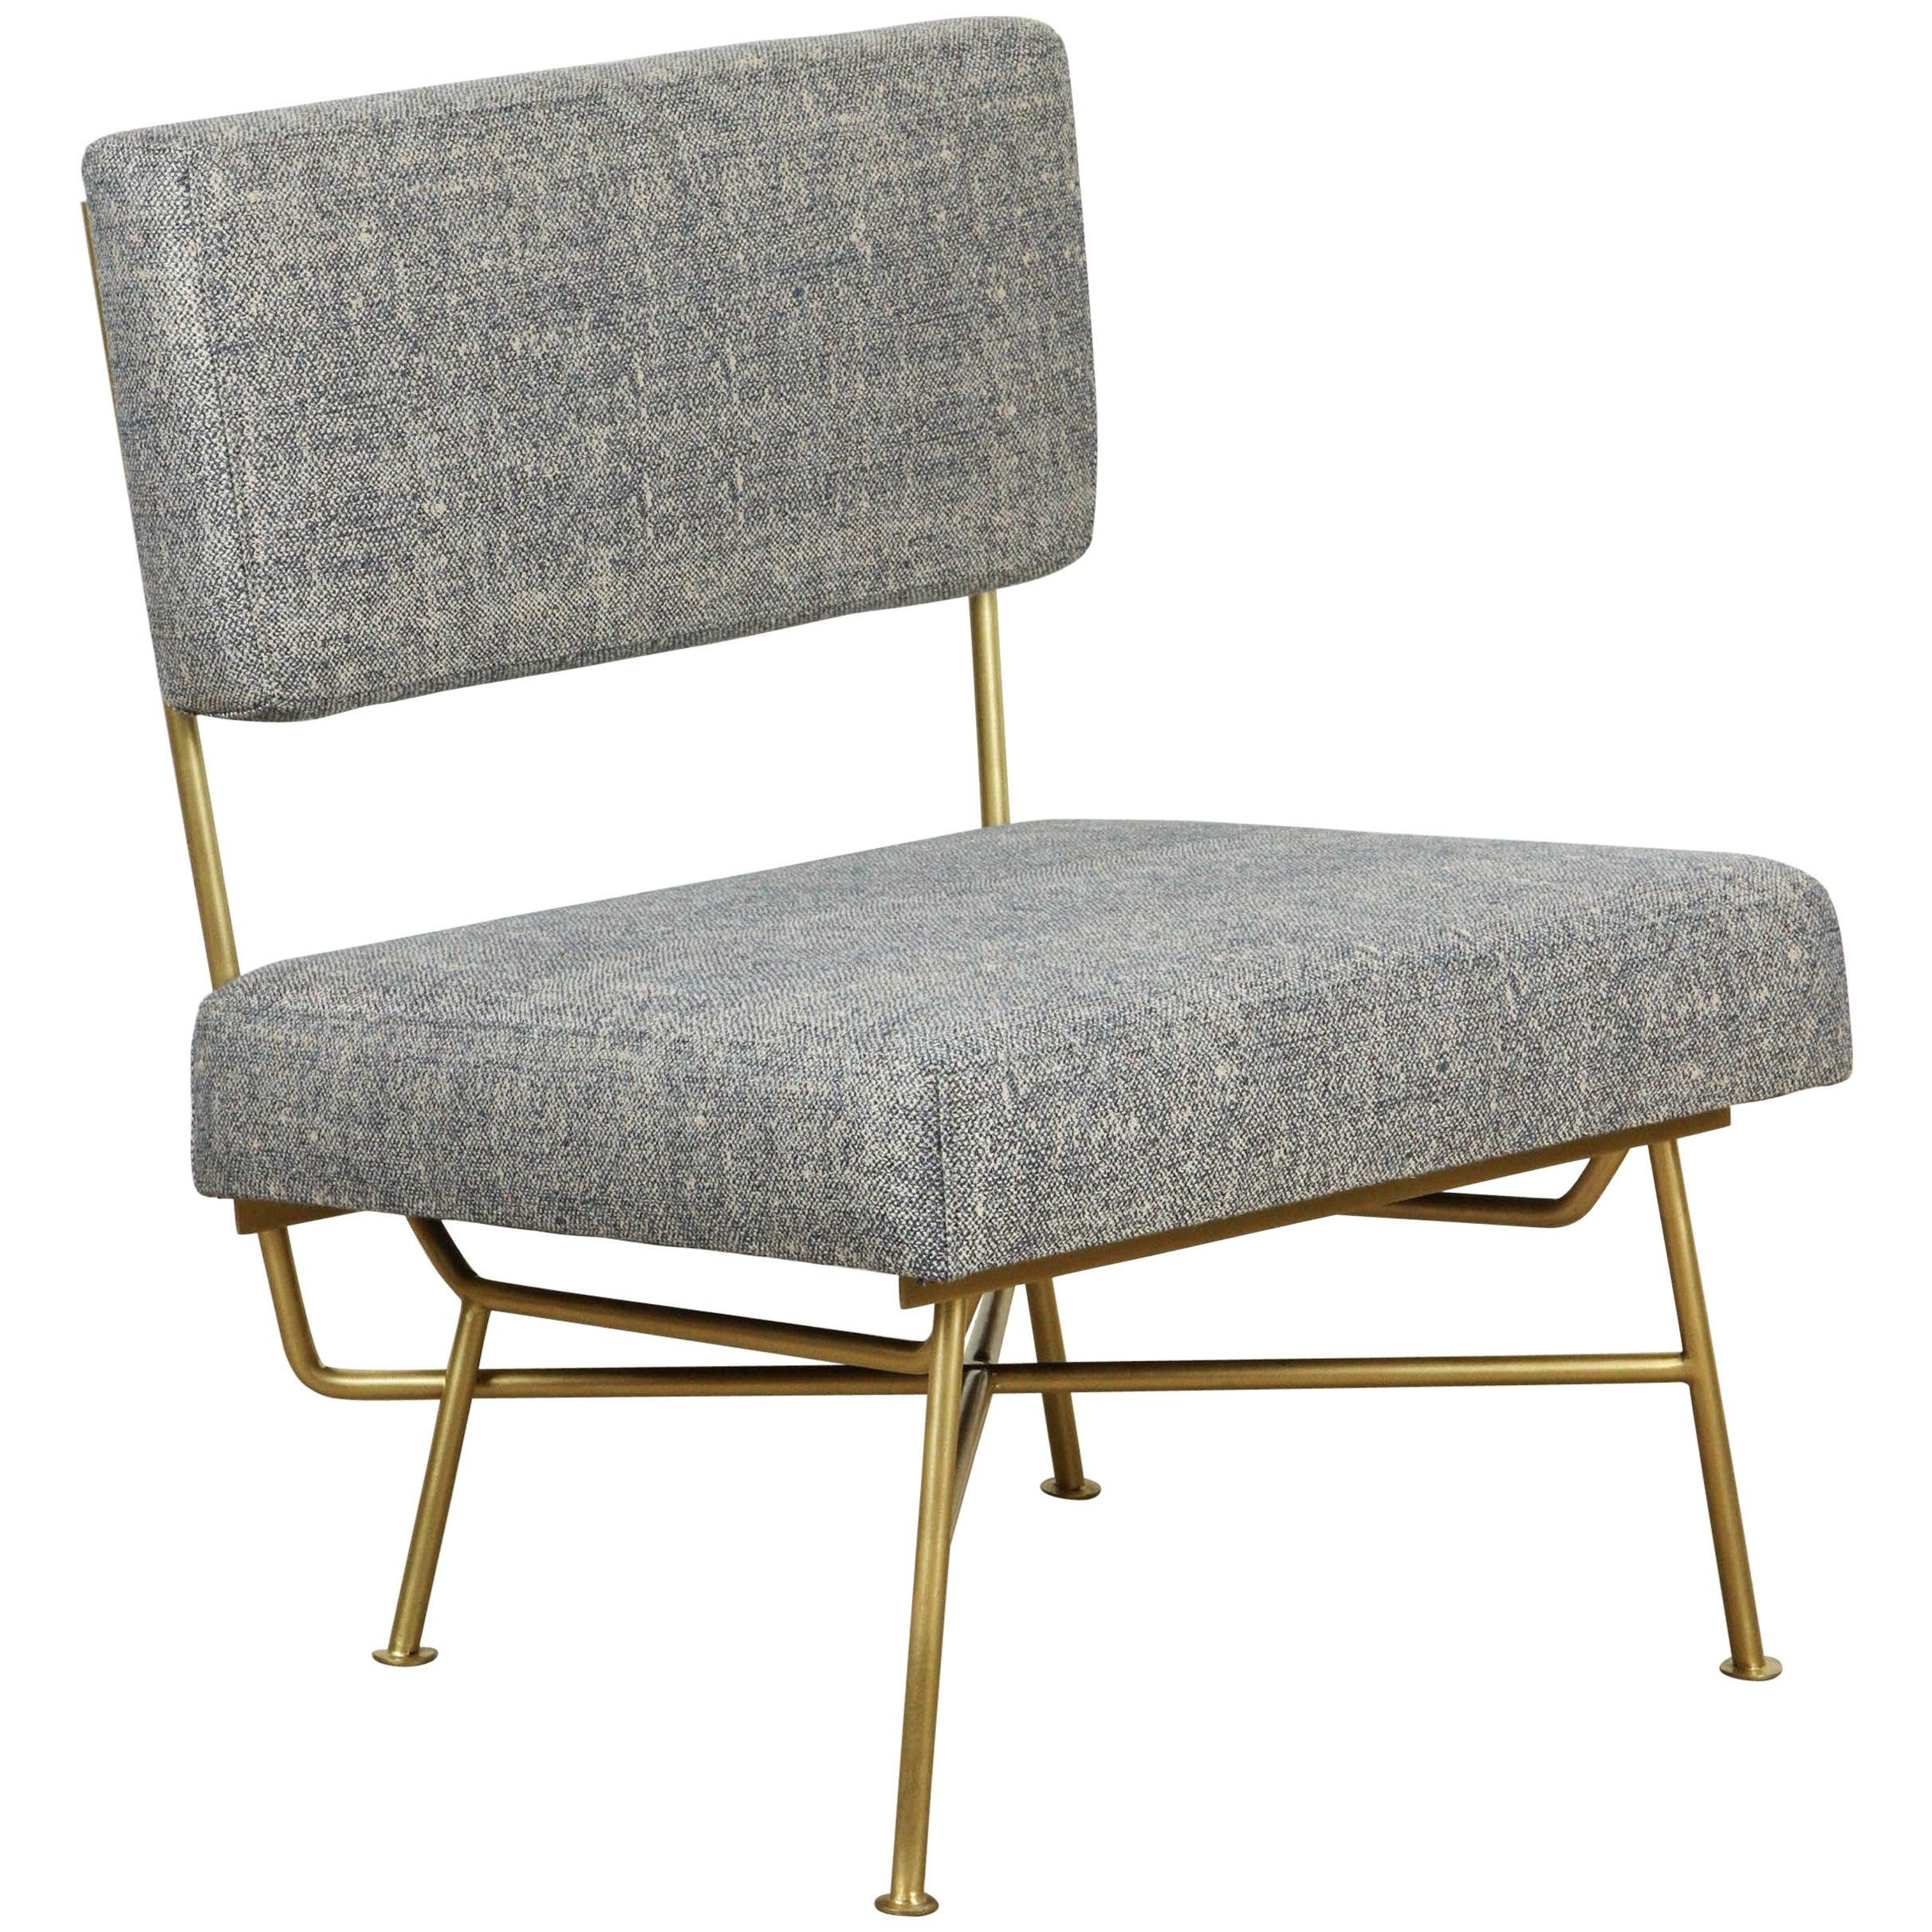 Montrose Chair by Lawson-Fenning